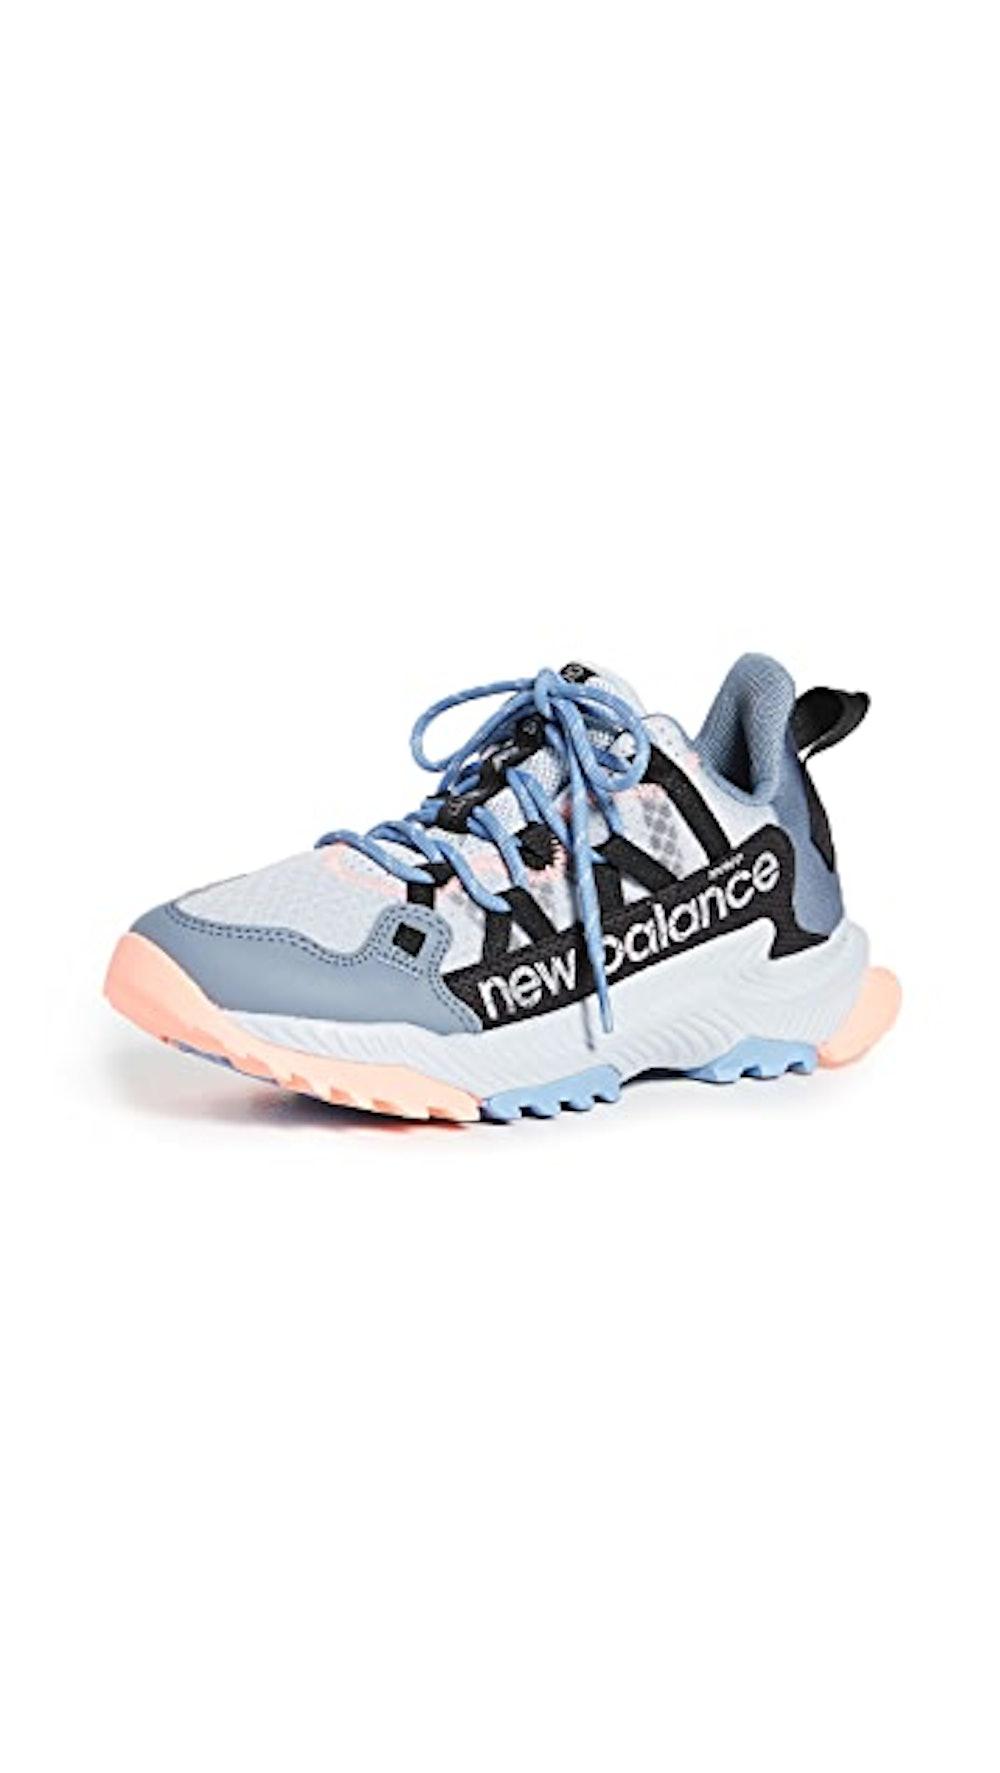 New Balance Fresh Foam Hierro V6 Sneakers